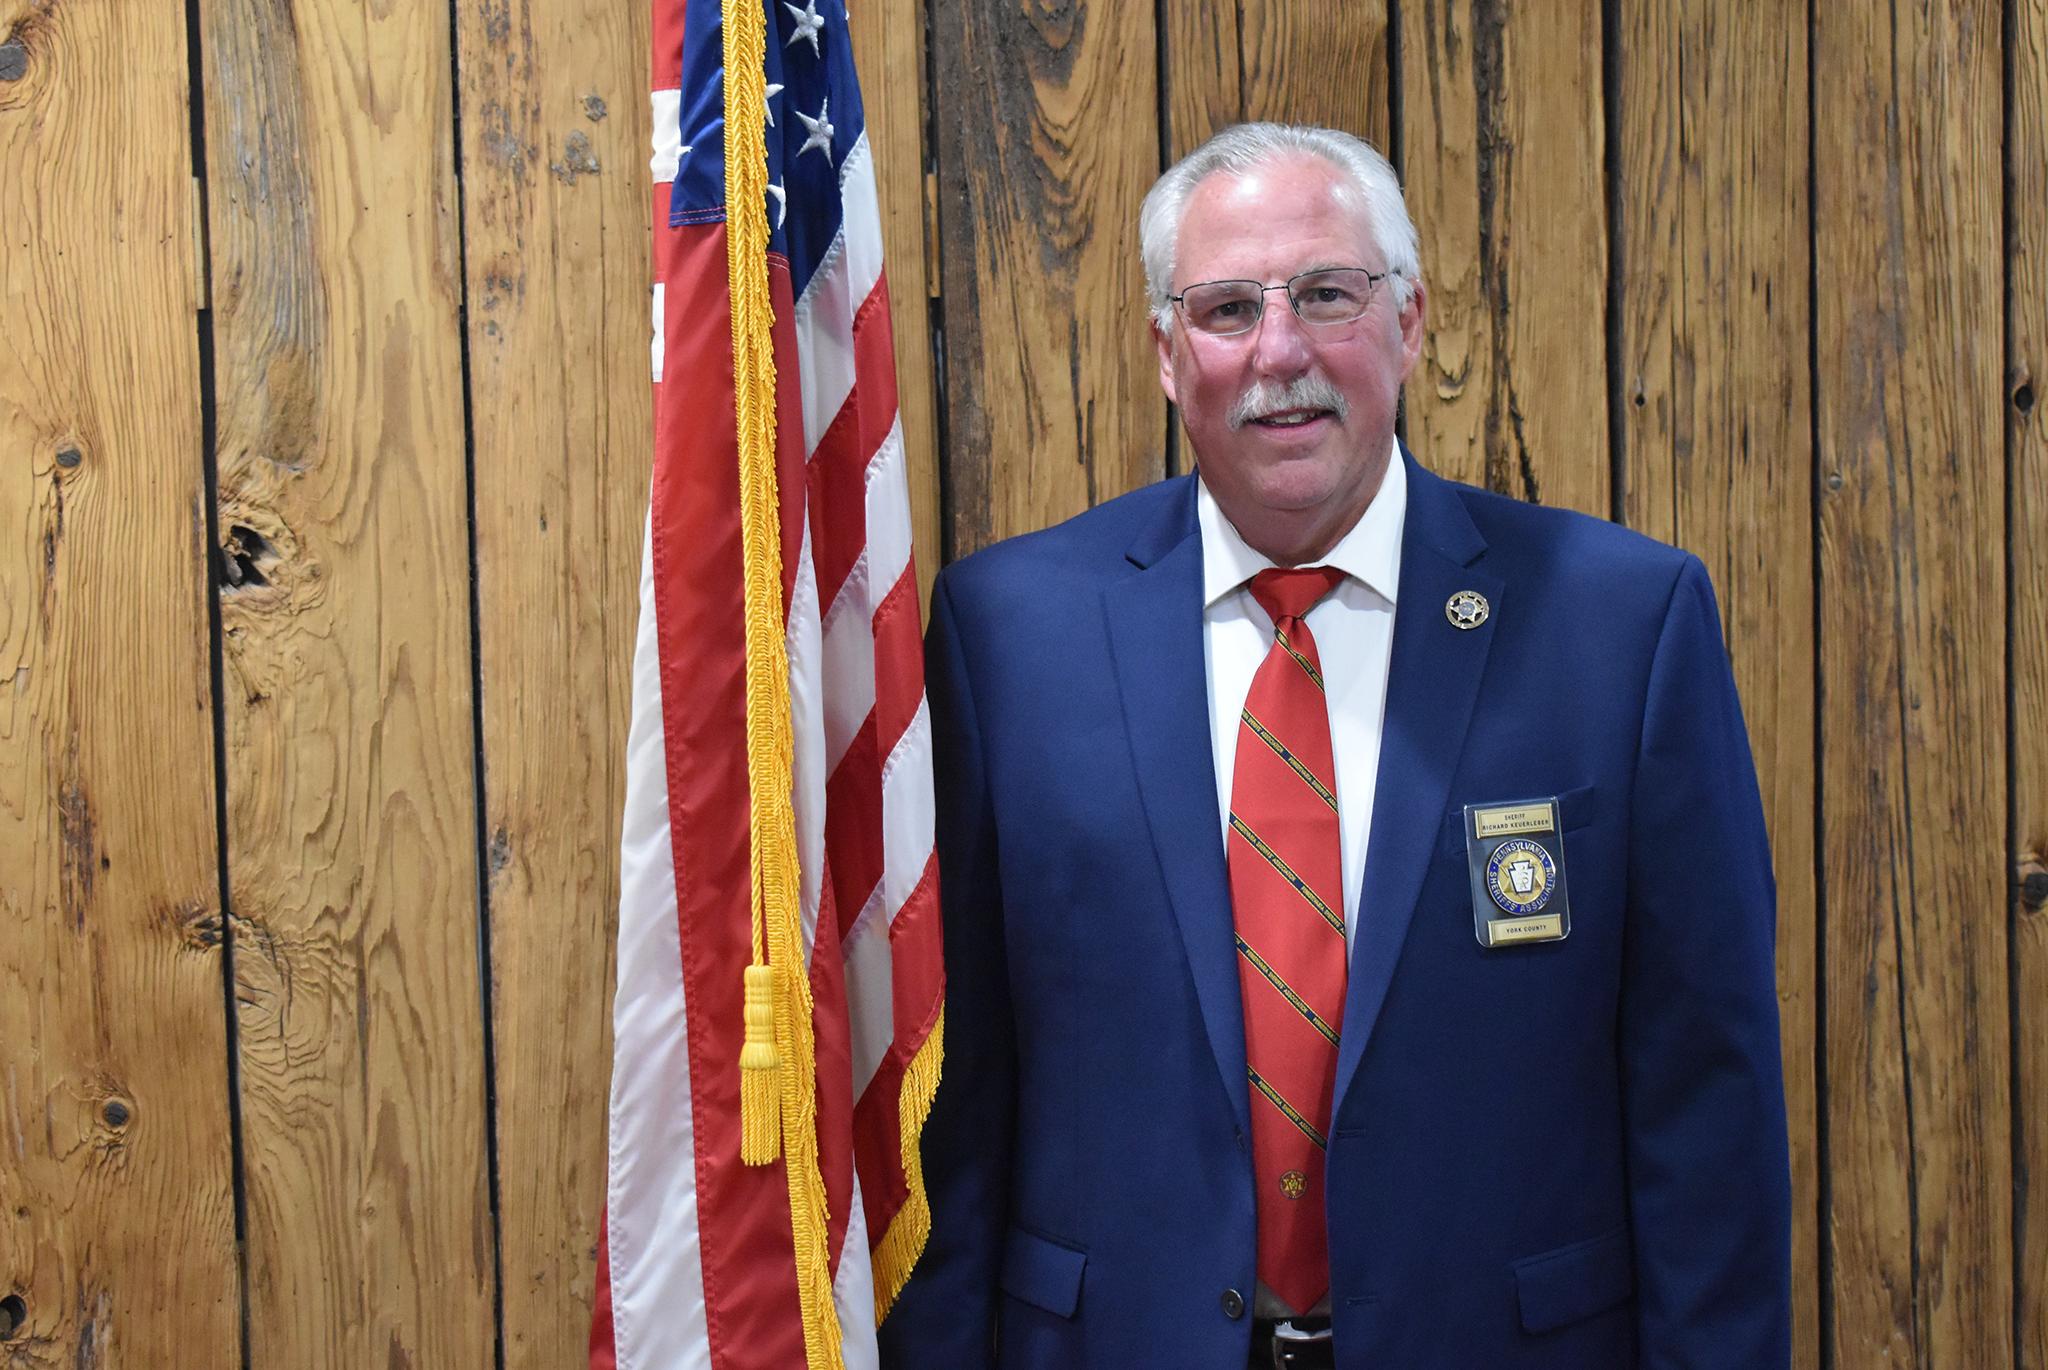 Sheriff Rich Keuerleber